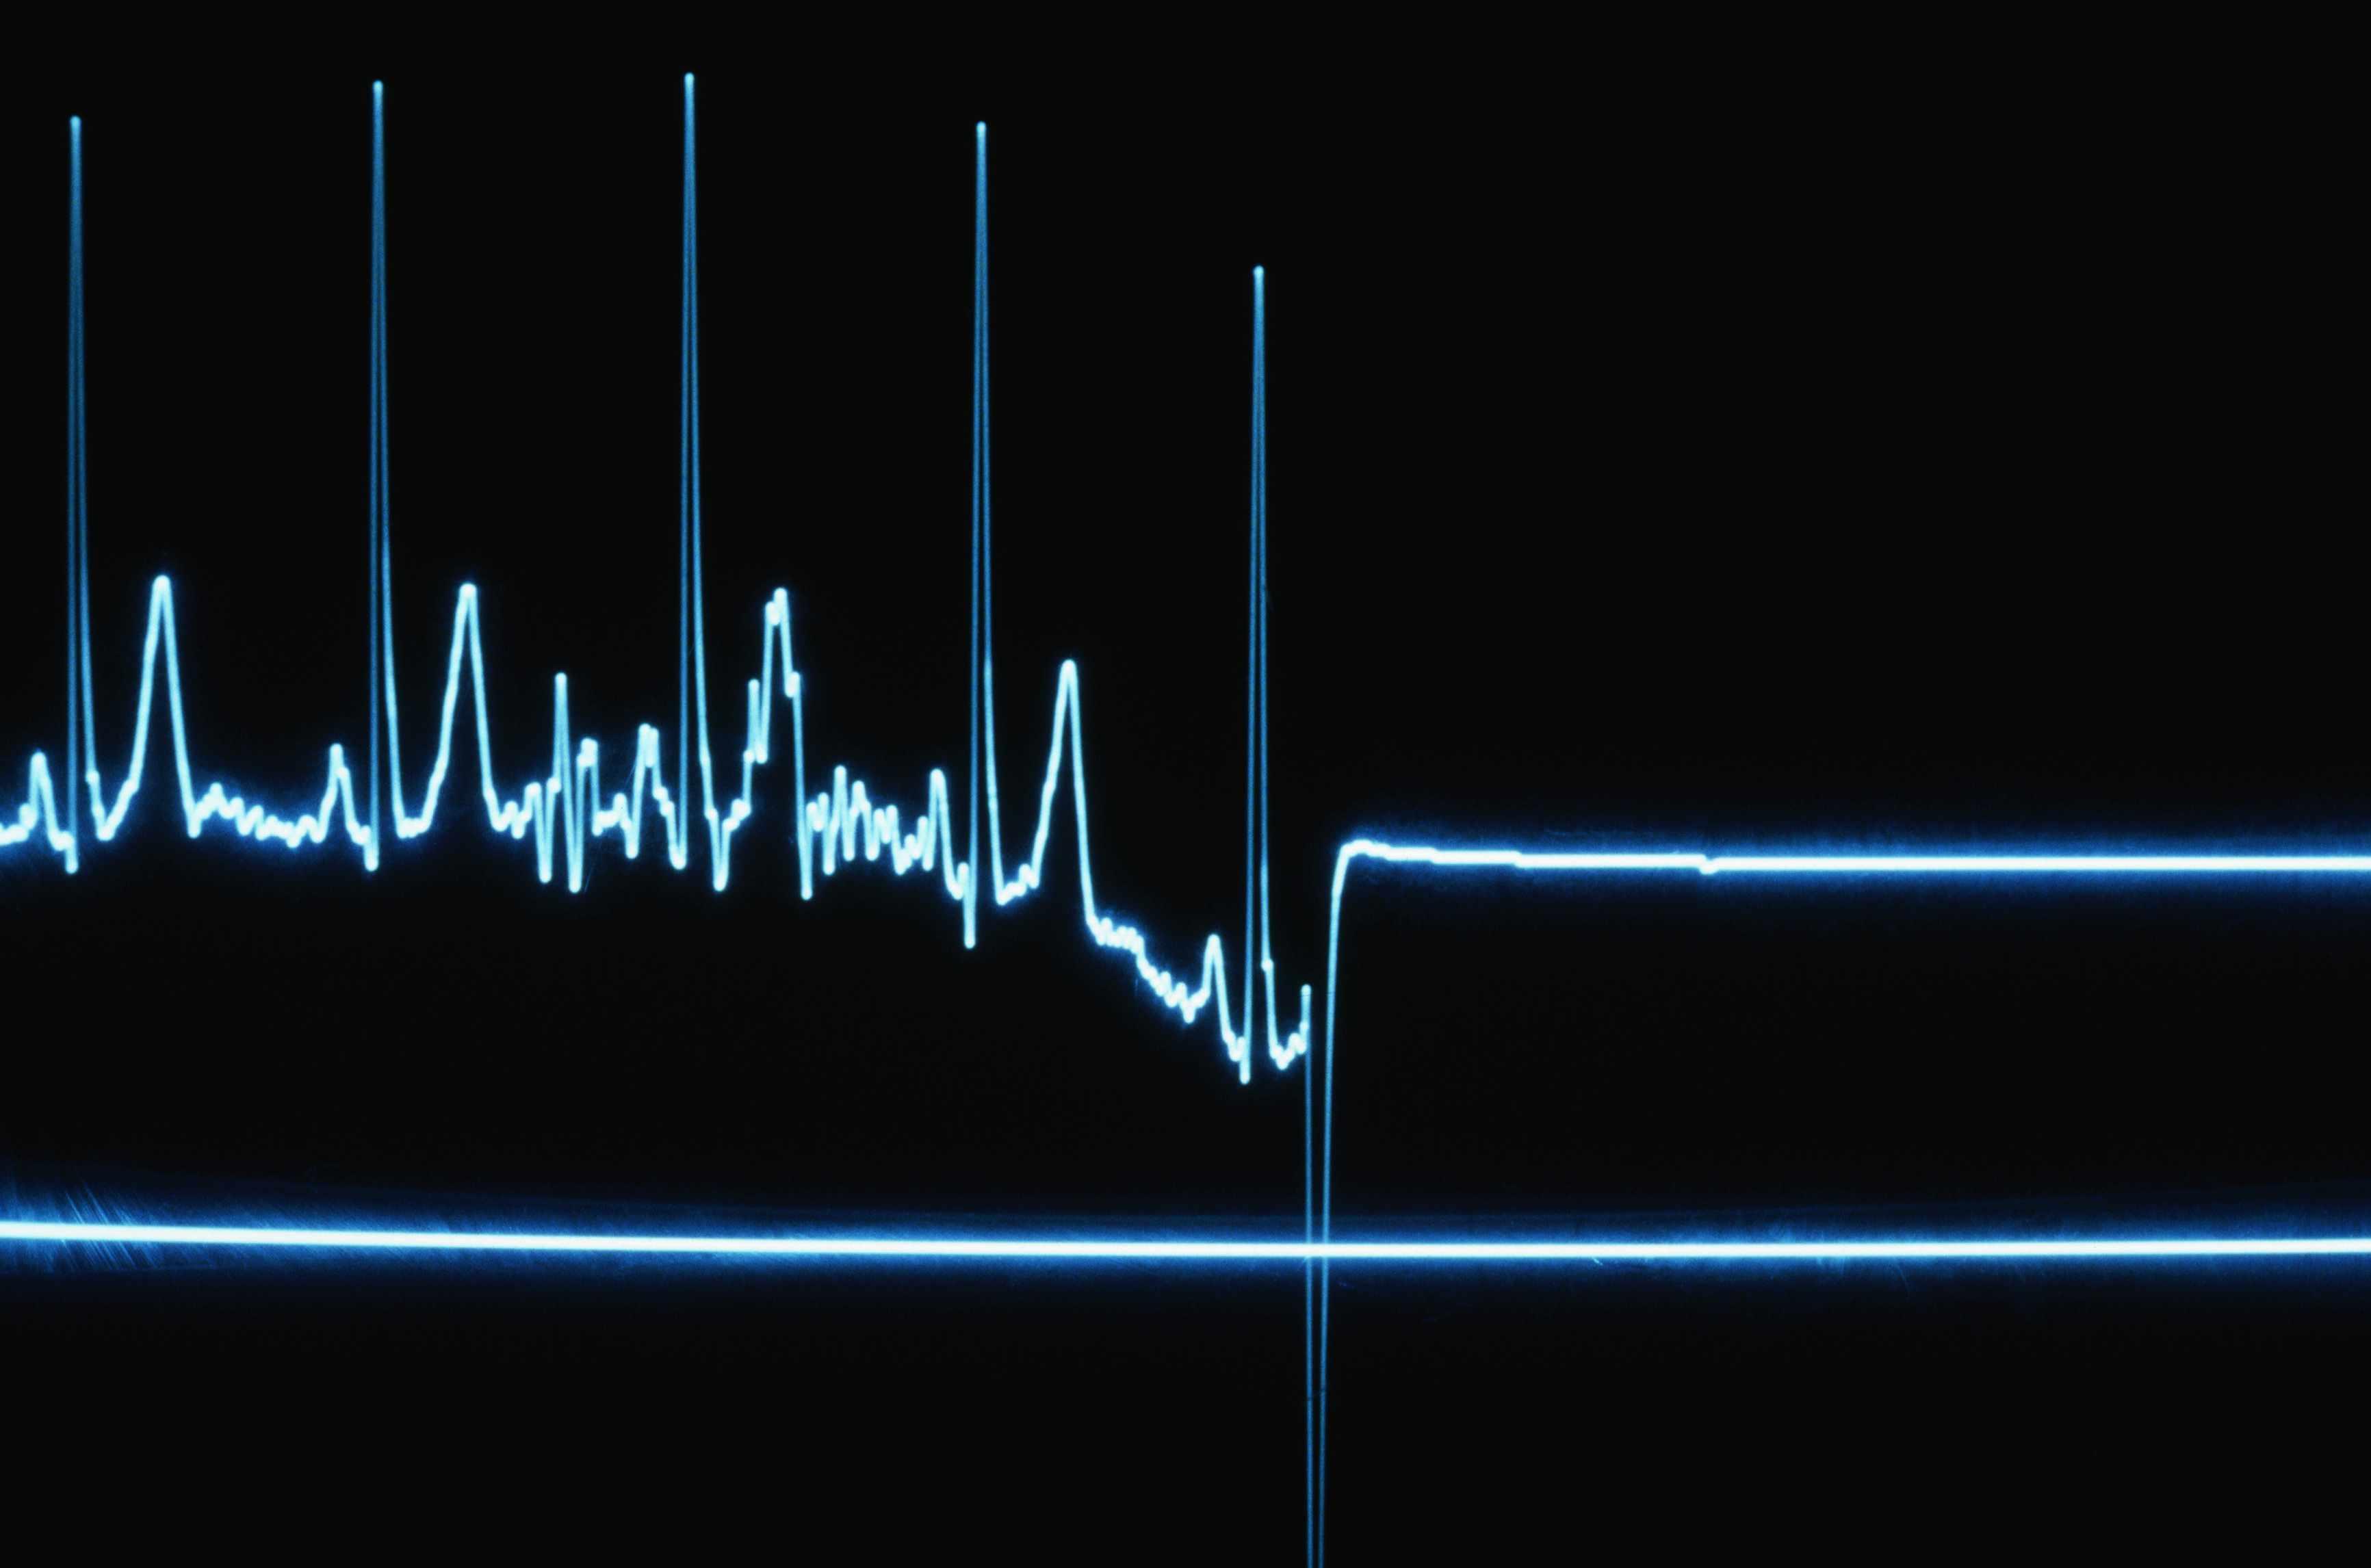 Flatline on a Heart Monitor